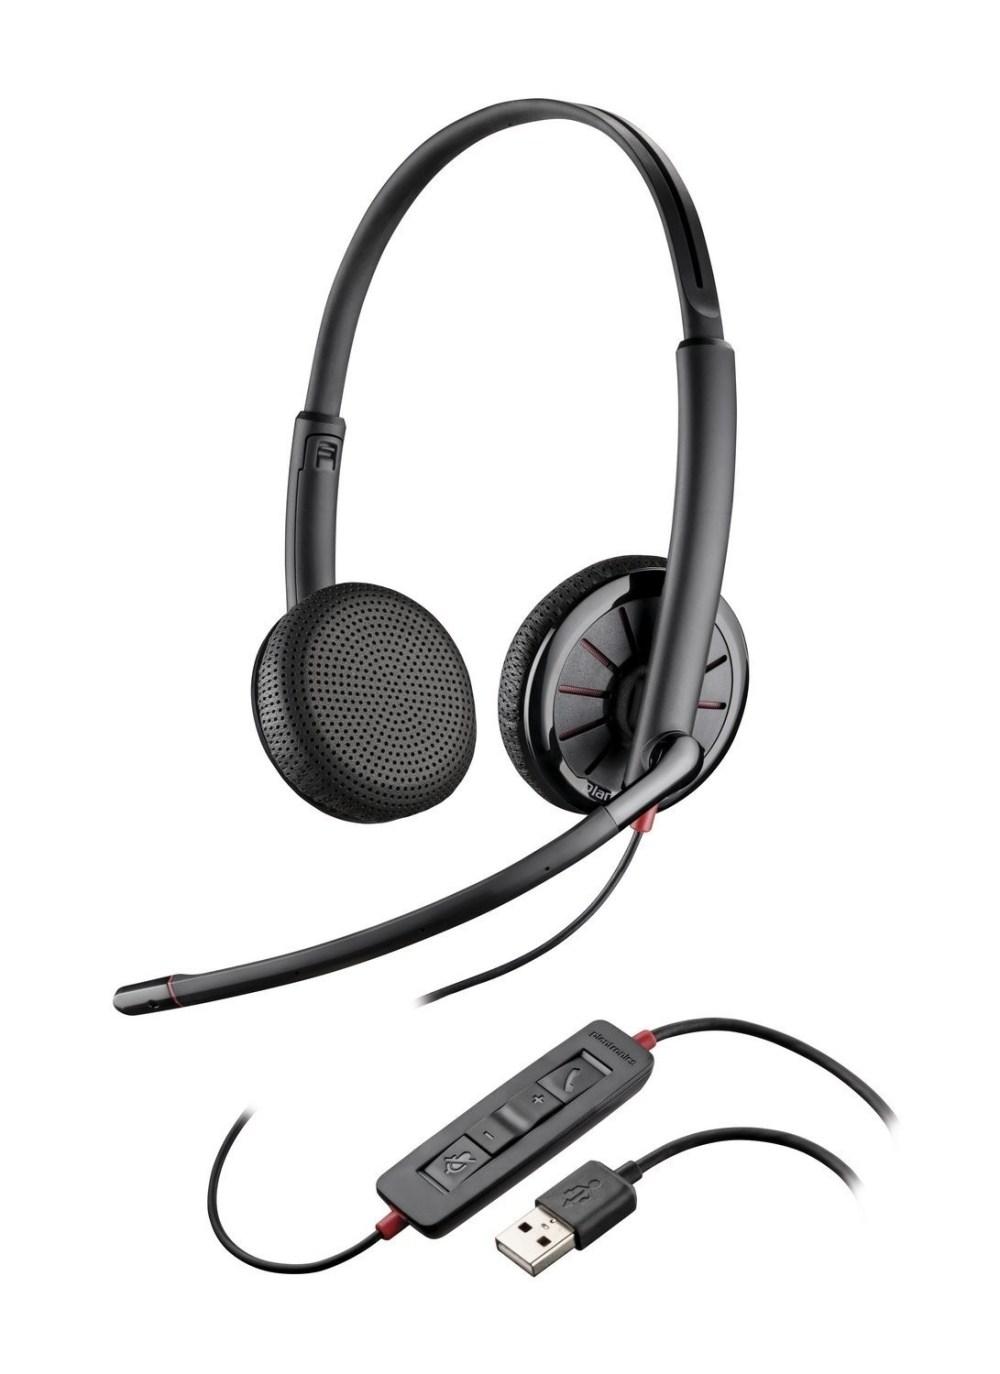 medium resolution of  plantronics blackwire binaural headset with 3 5mm usb c325 1 or c325 1 m